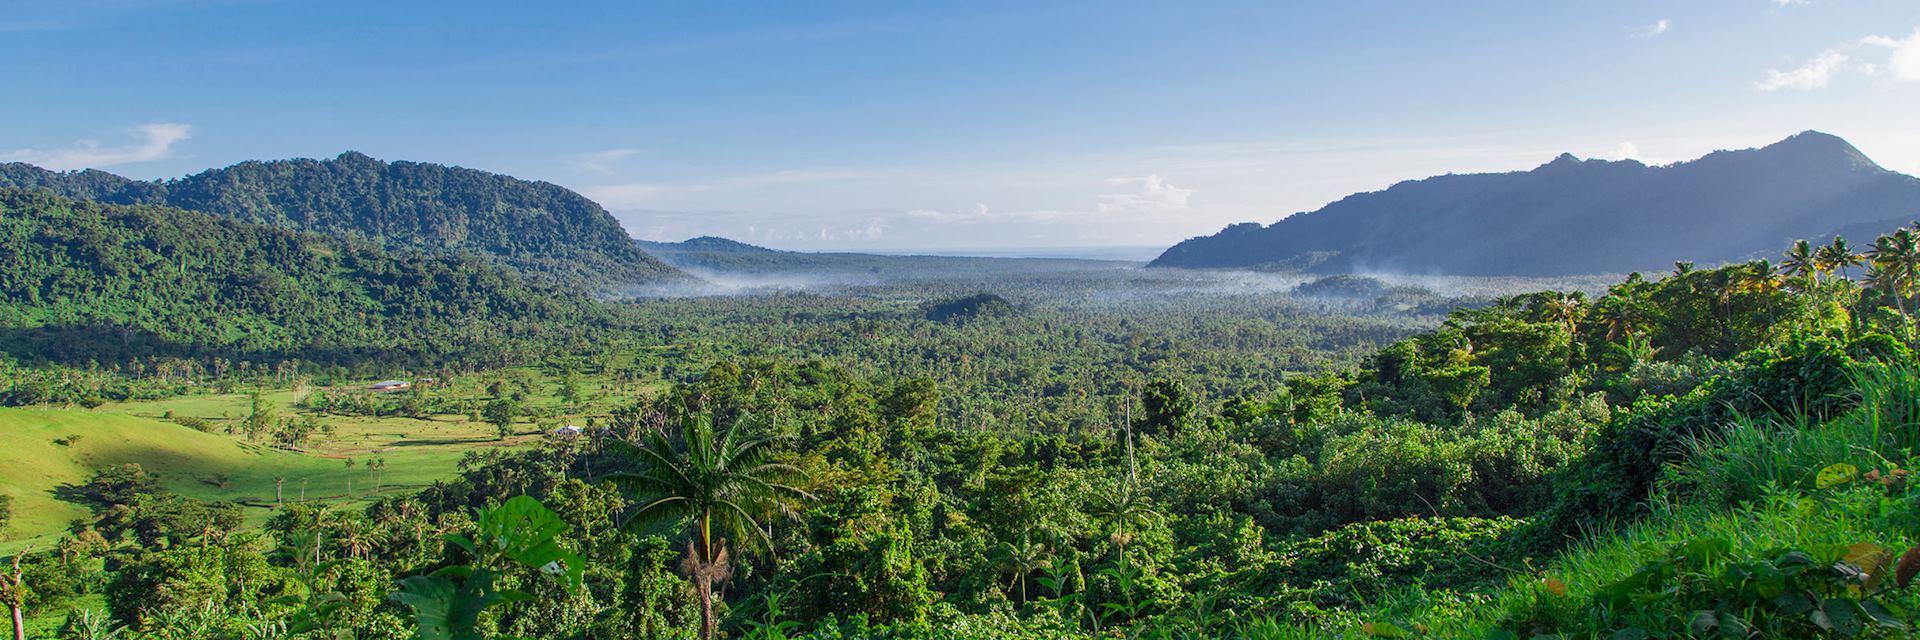 Lush vegetation of Samoa